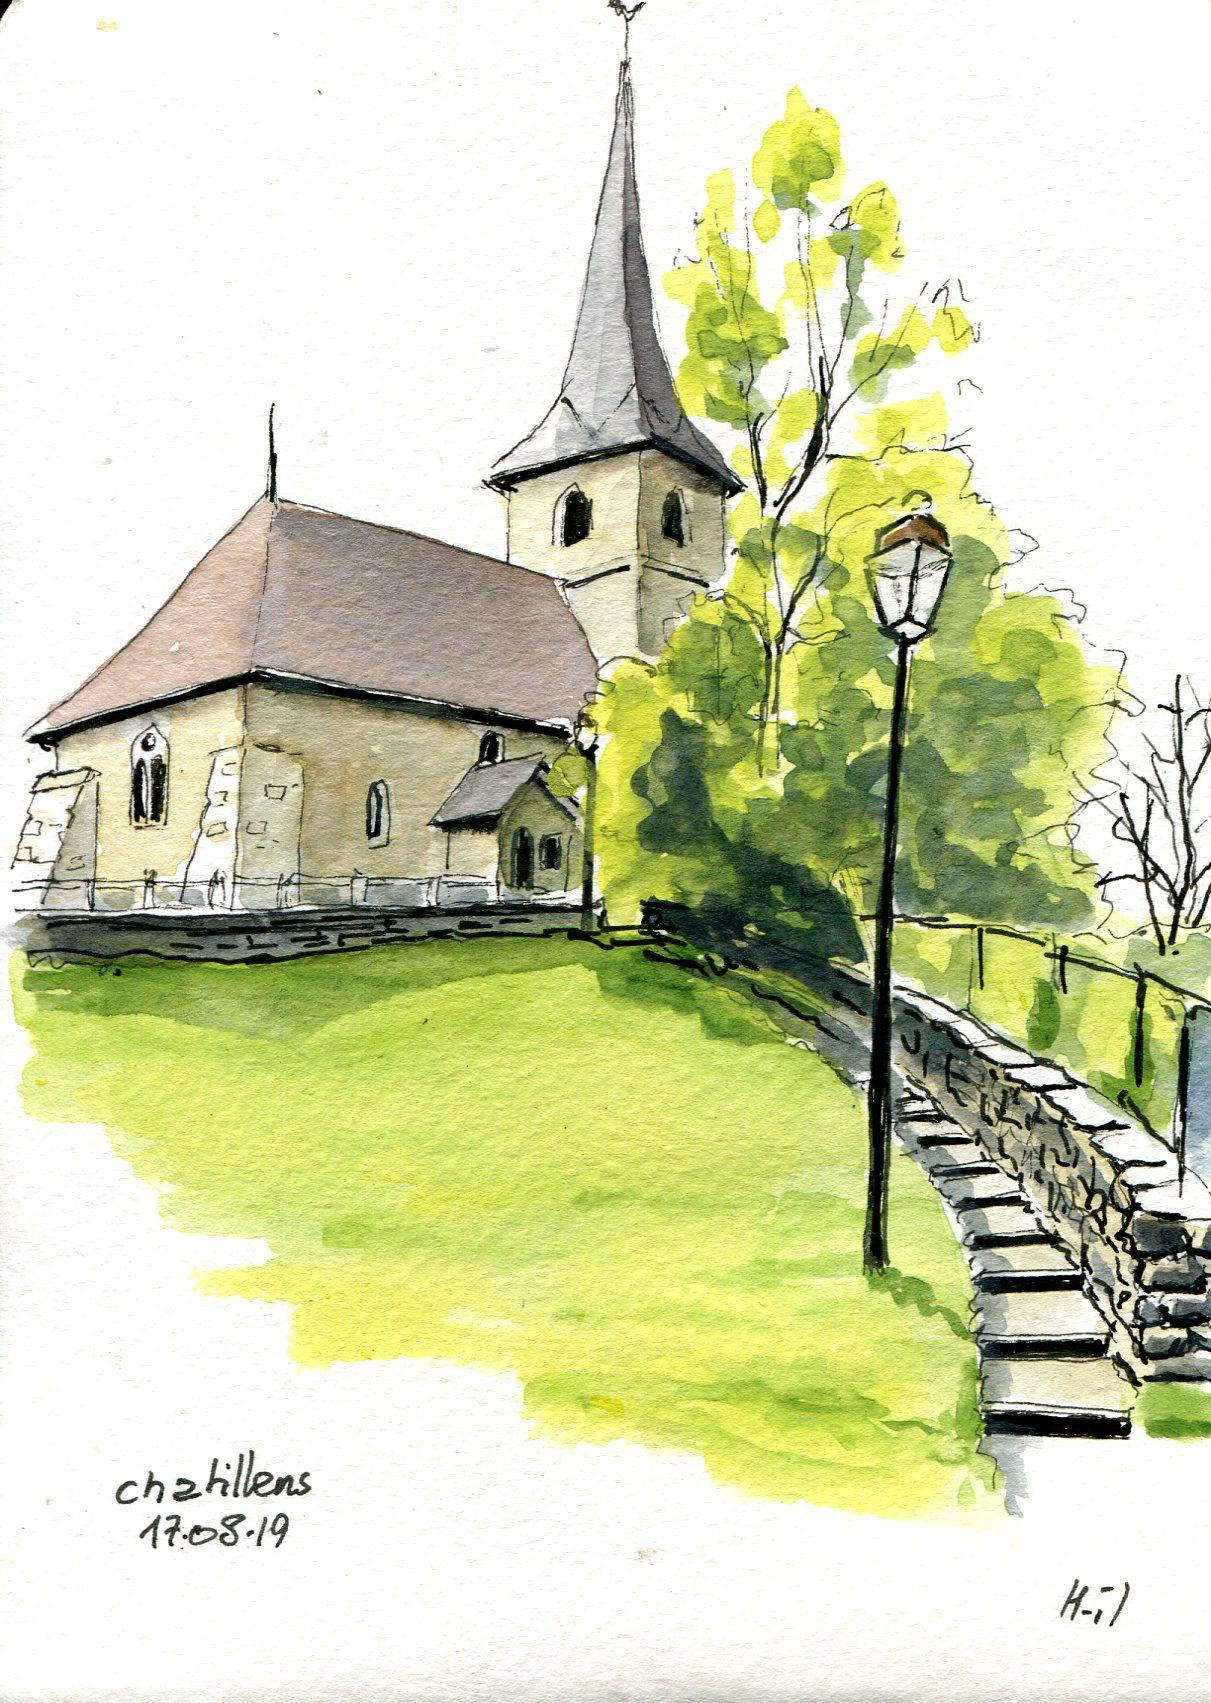 Eglise chatillens003